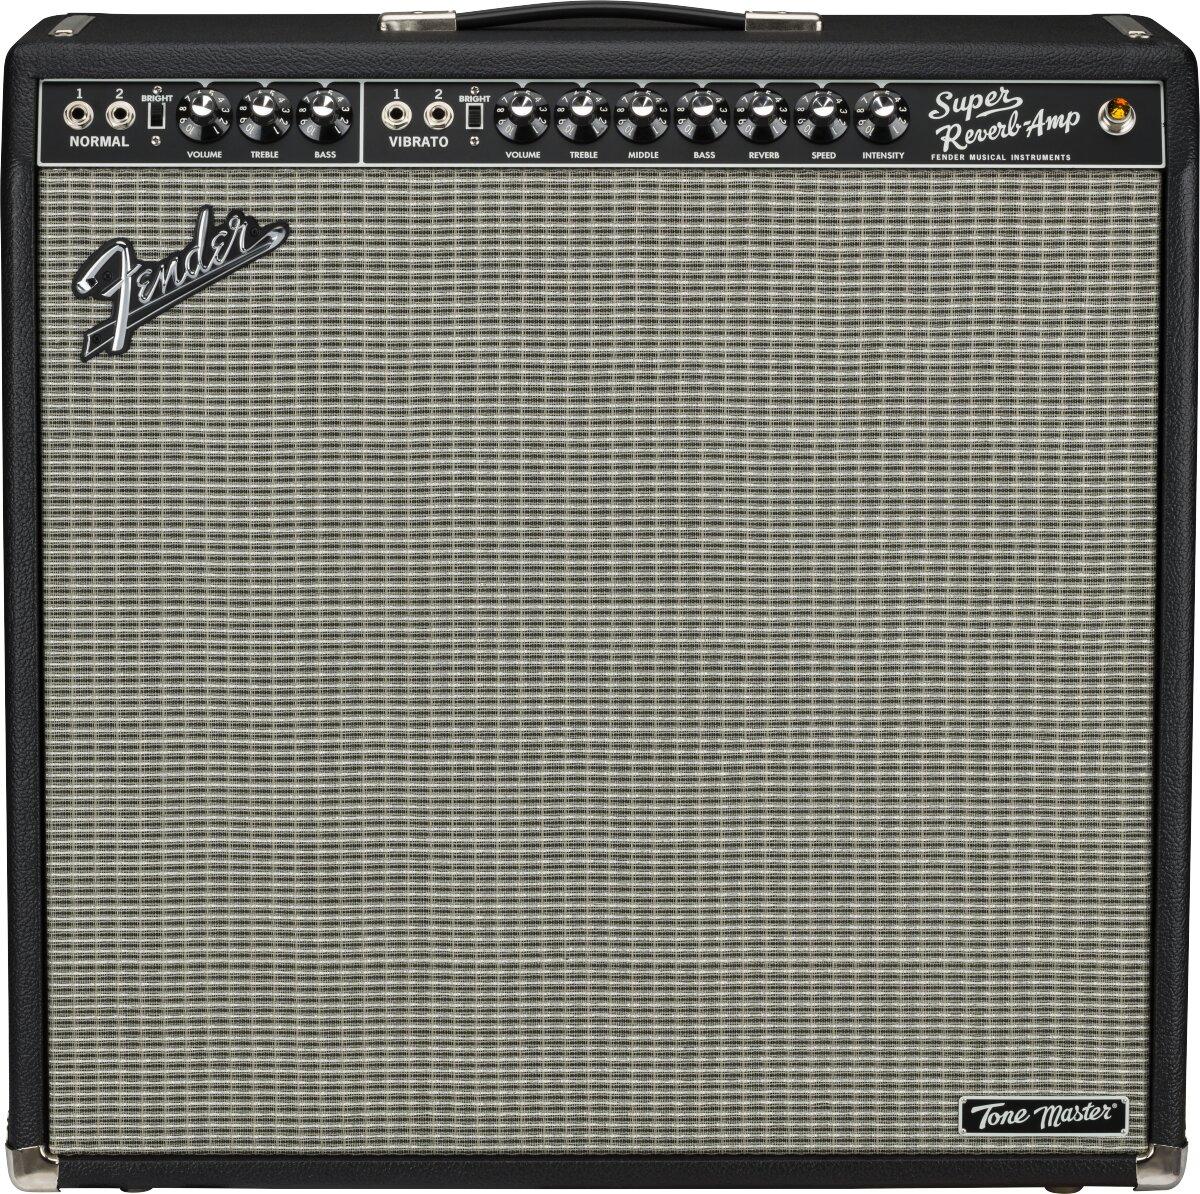 Fender Tone Master Super Reverb : photo 1